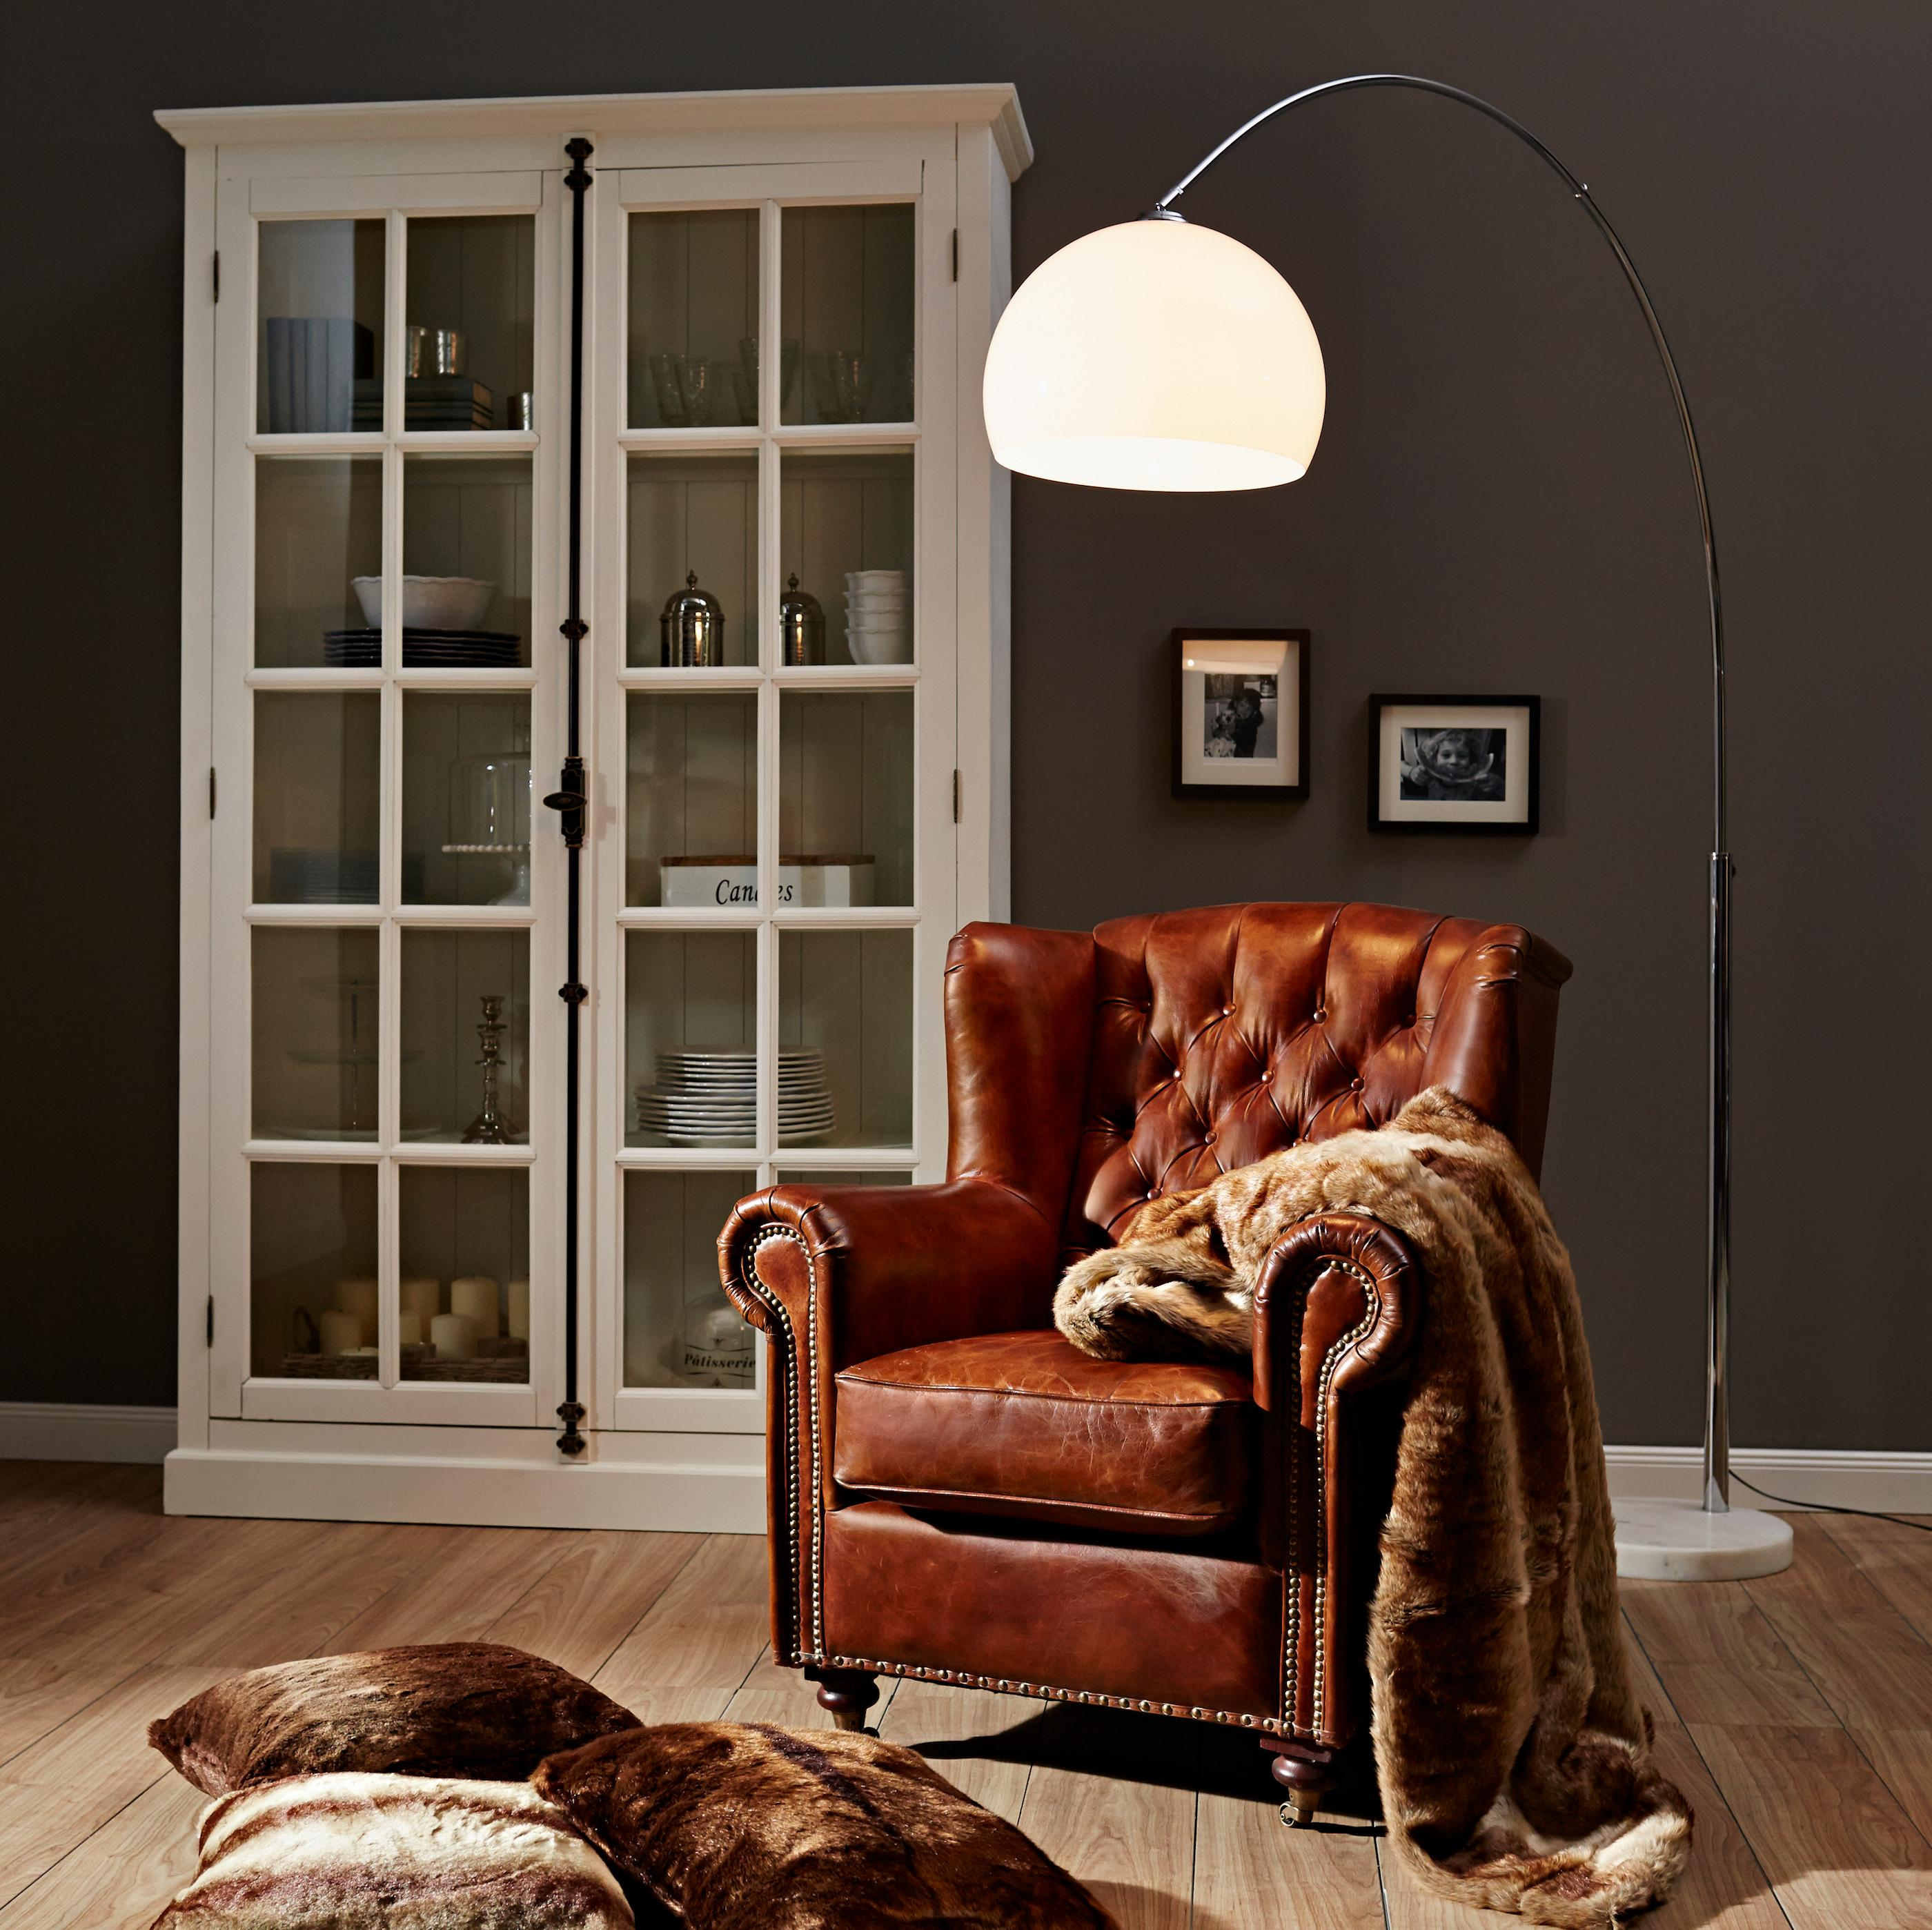 glasschrank • bilder & ideen • couchstyle, Hause deko